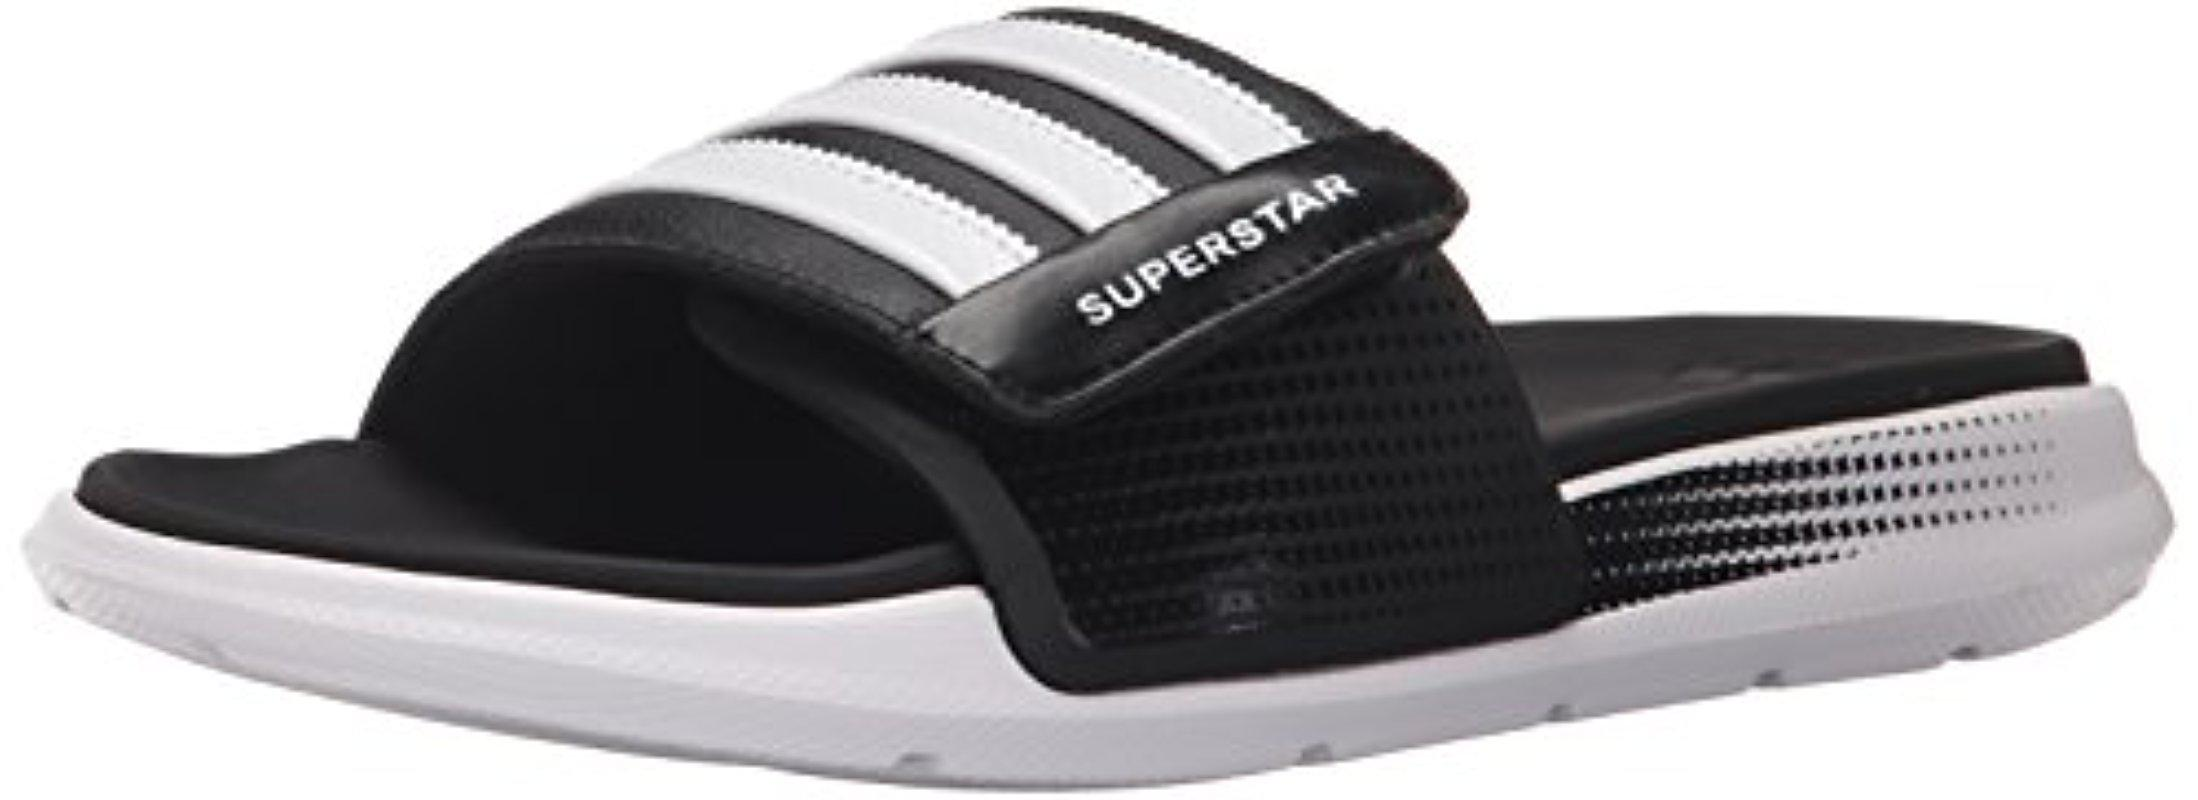 2cff121365c8b Lyst - adidas Originals Adidas Performance Superstar 4g M Sandal in ...